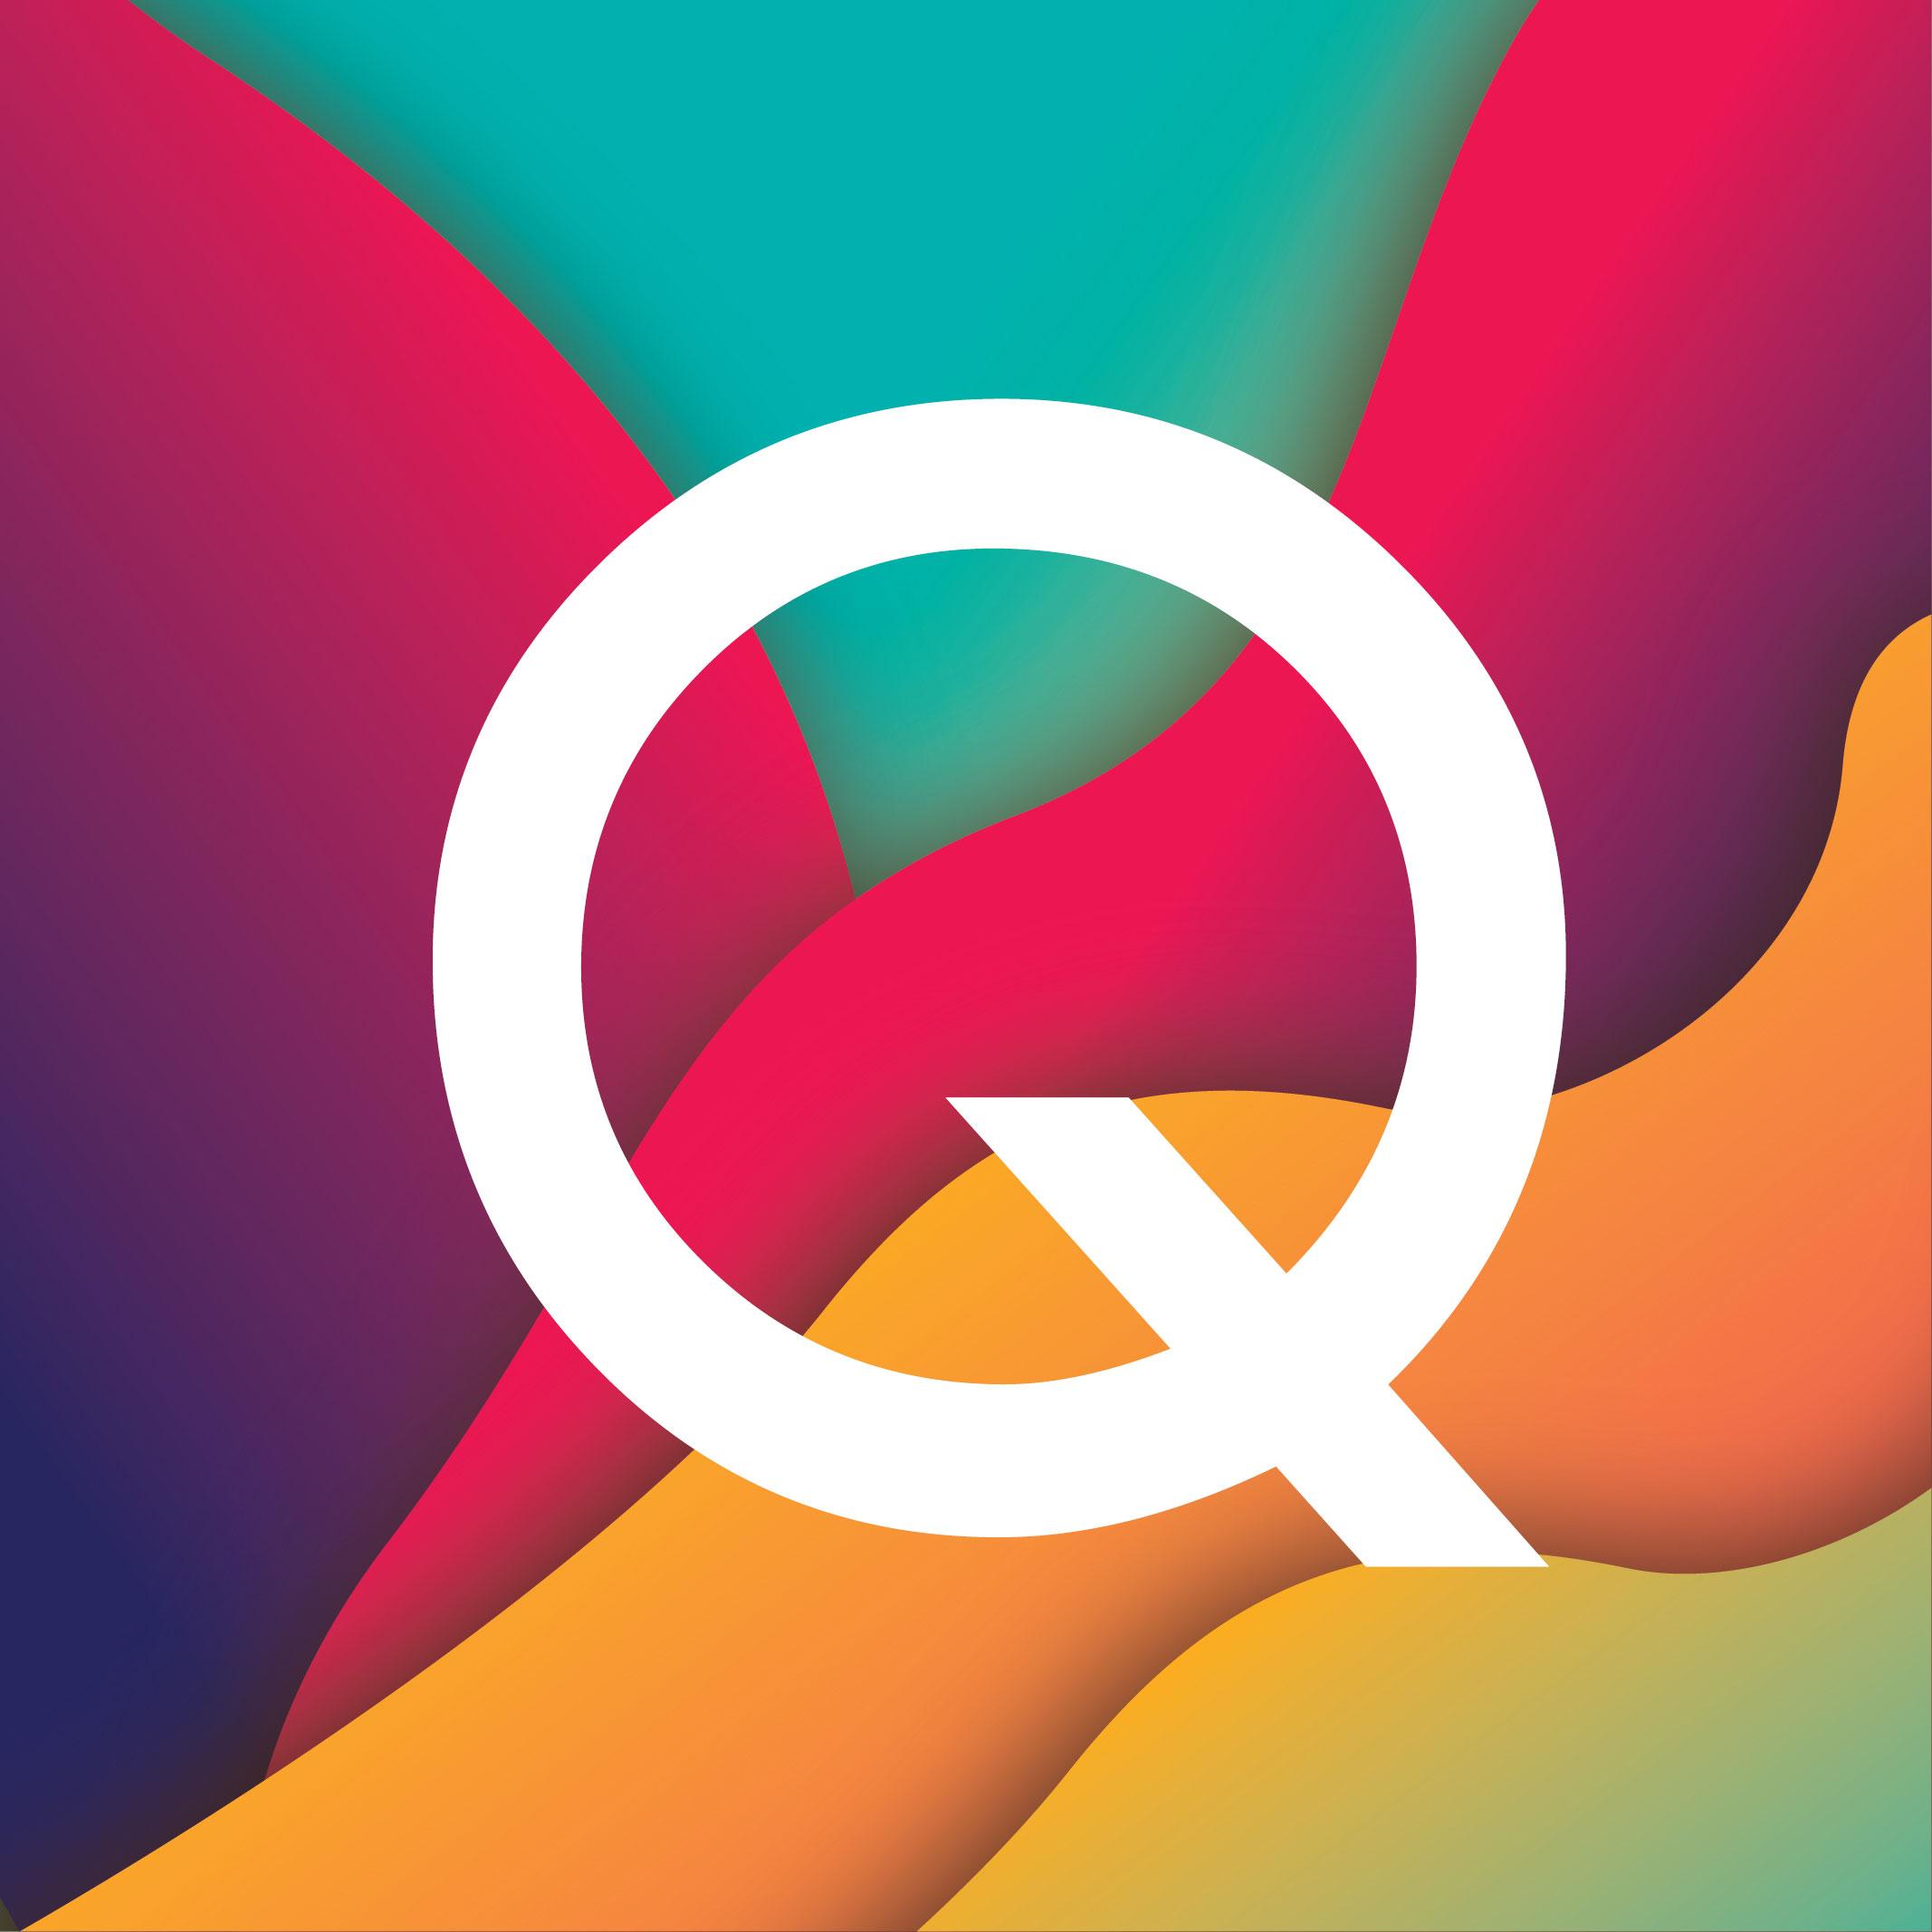 QUIRKS_NOVELTIES_CURIOSITIES